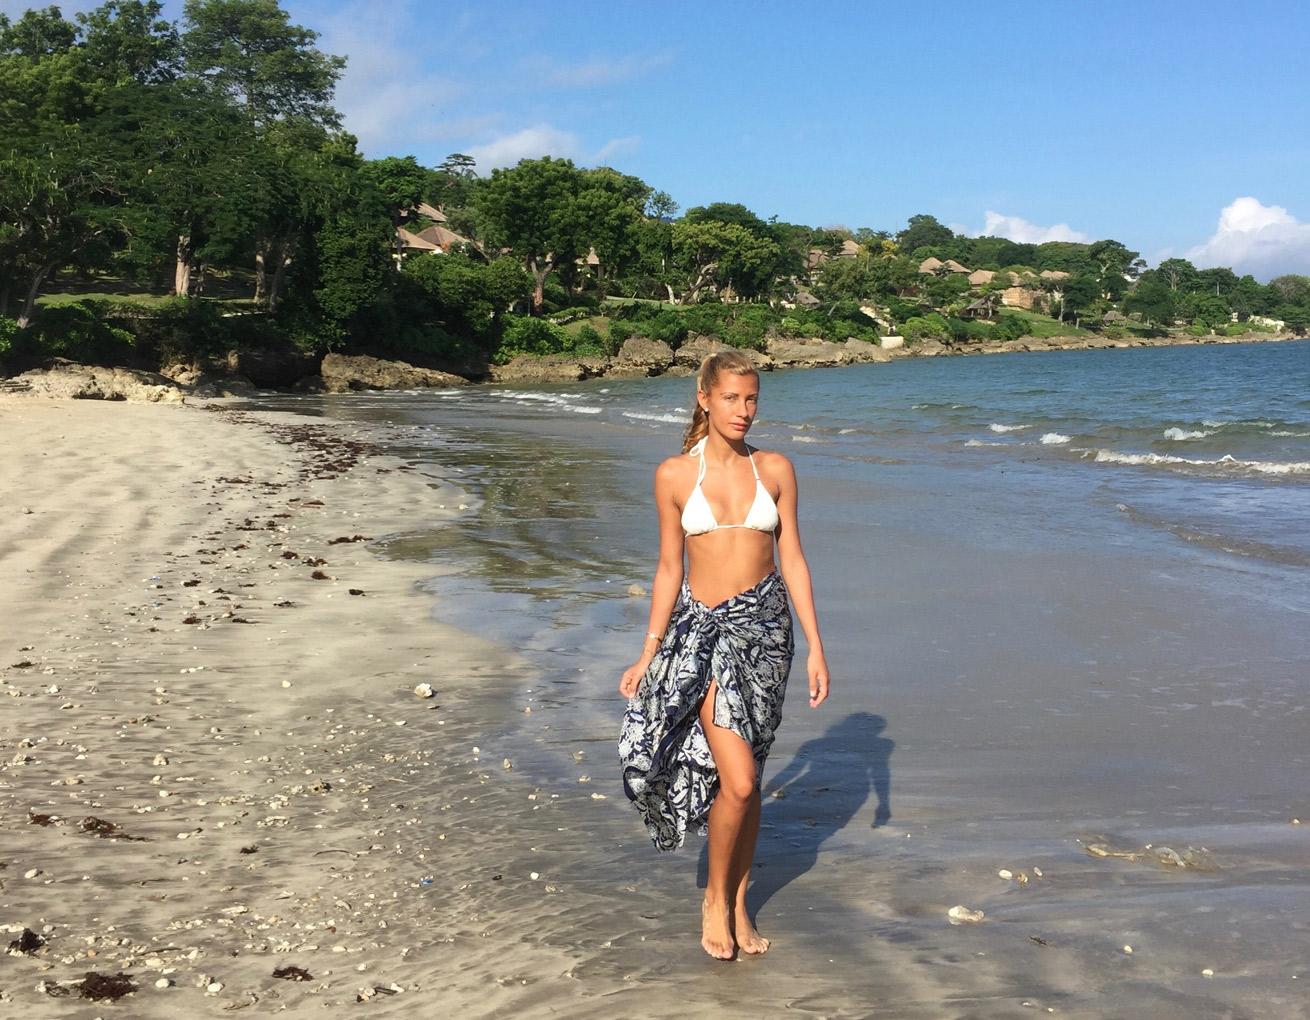 bali, indonesia, indian ocean, travel, hotel, vacation, beach, wellness